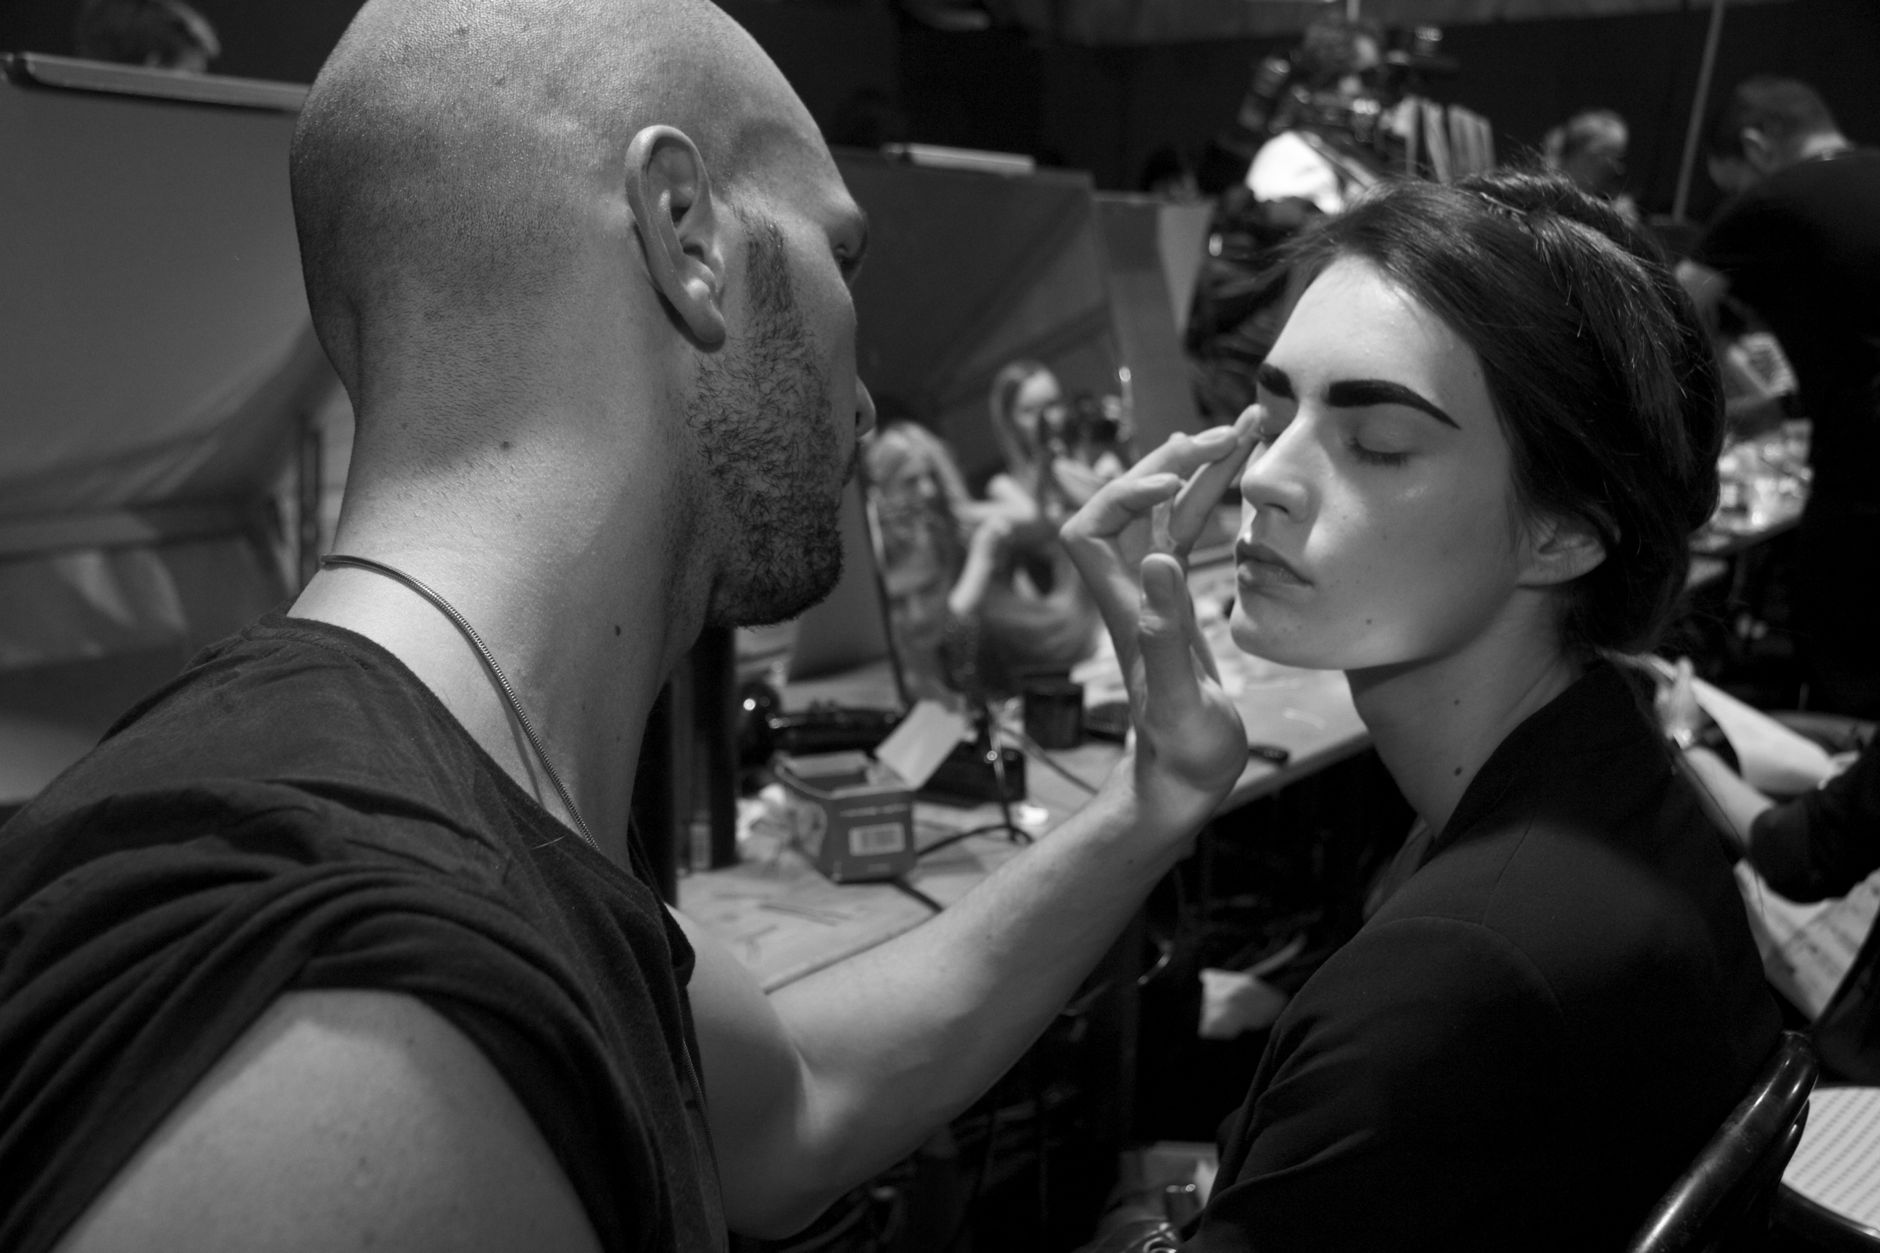 Backstage Anteprima Fashion Show Makeup Milano Fashion Week